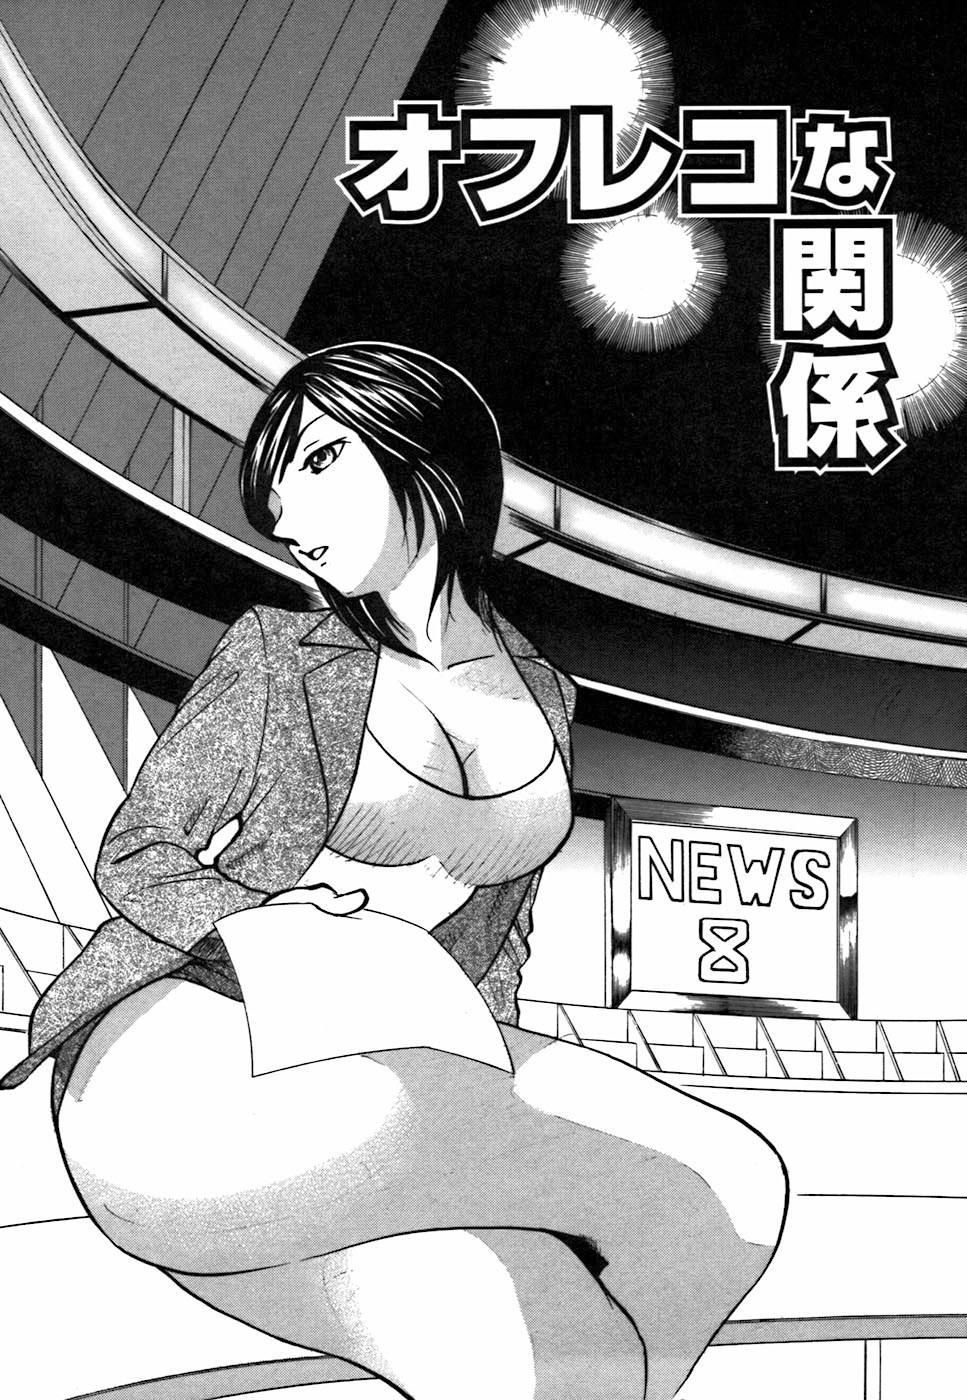 Kimi ga Nozomu Katachi | Appearance for which you hope 62